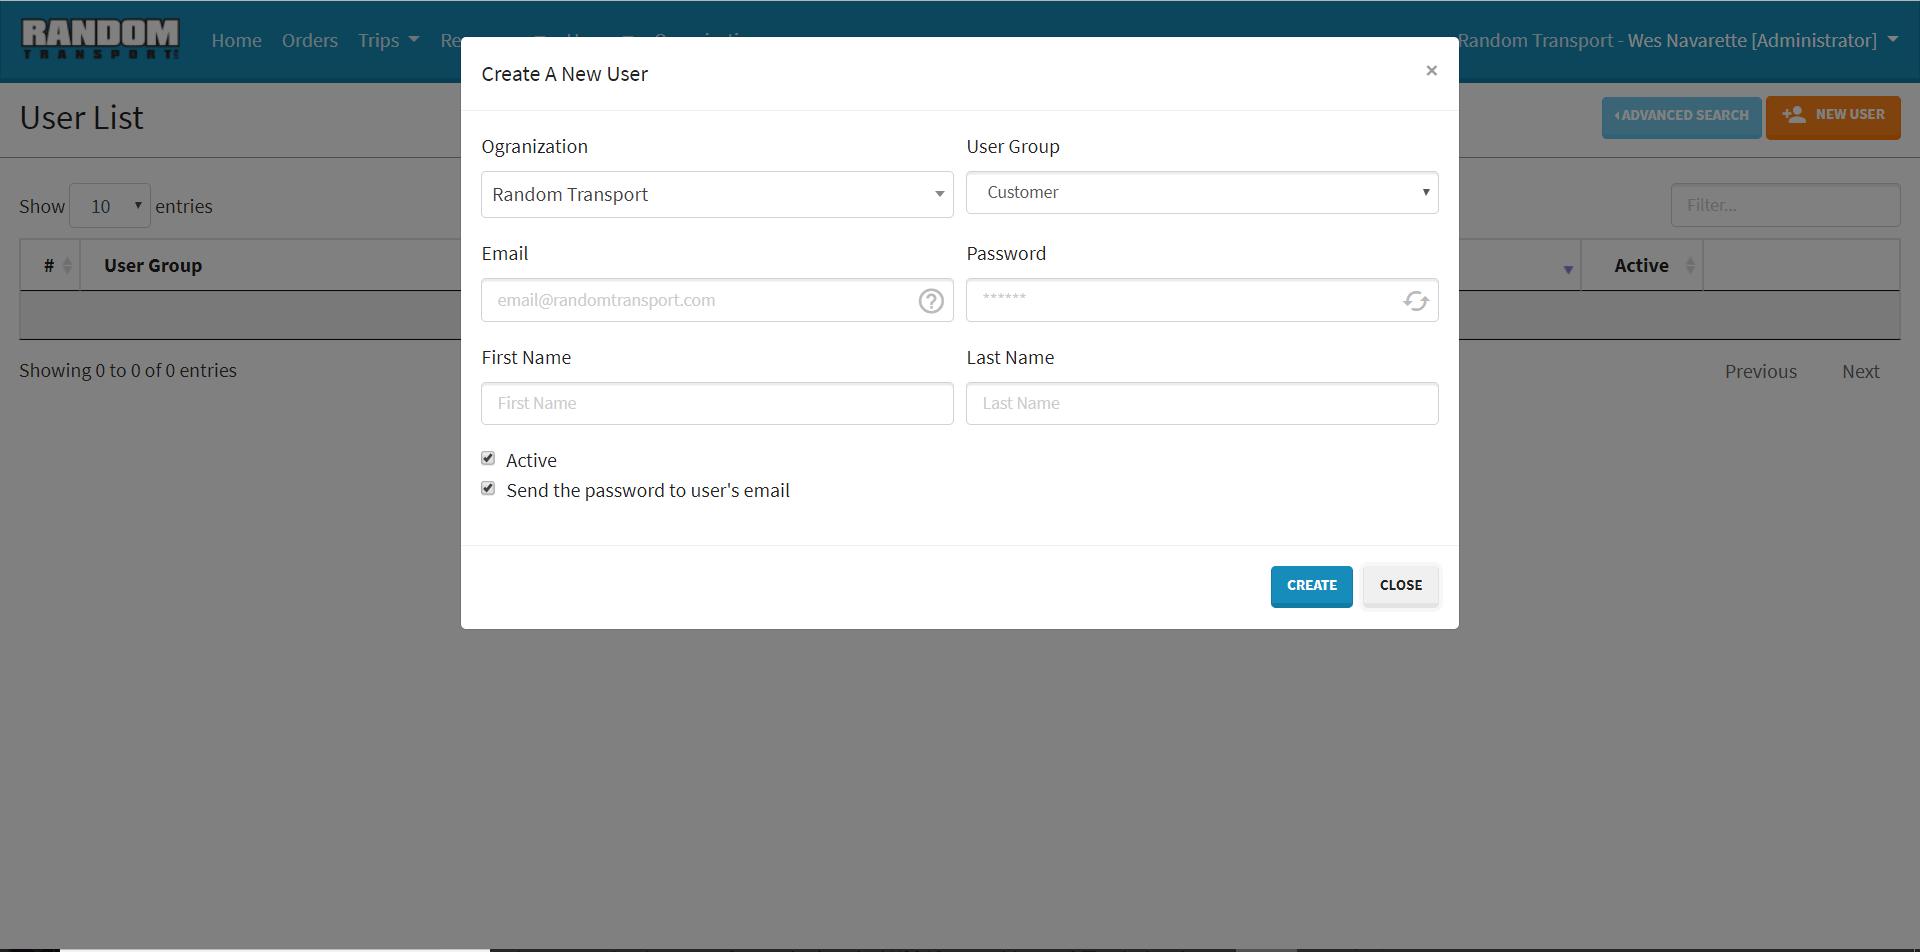 Random Transport - Create New User Screen